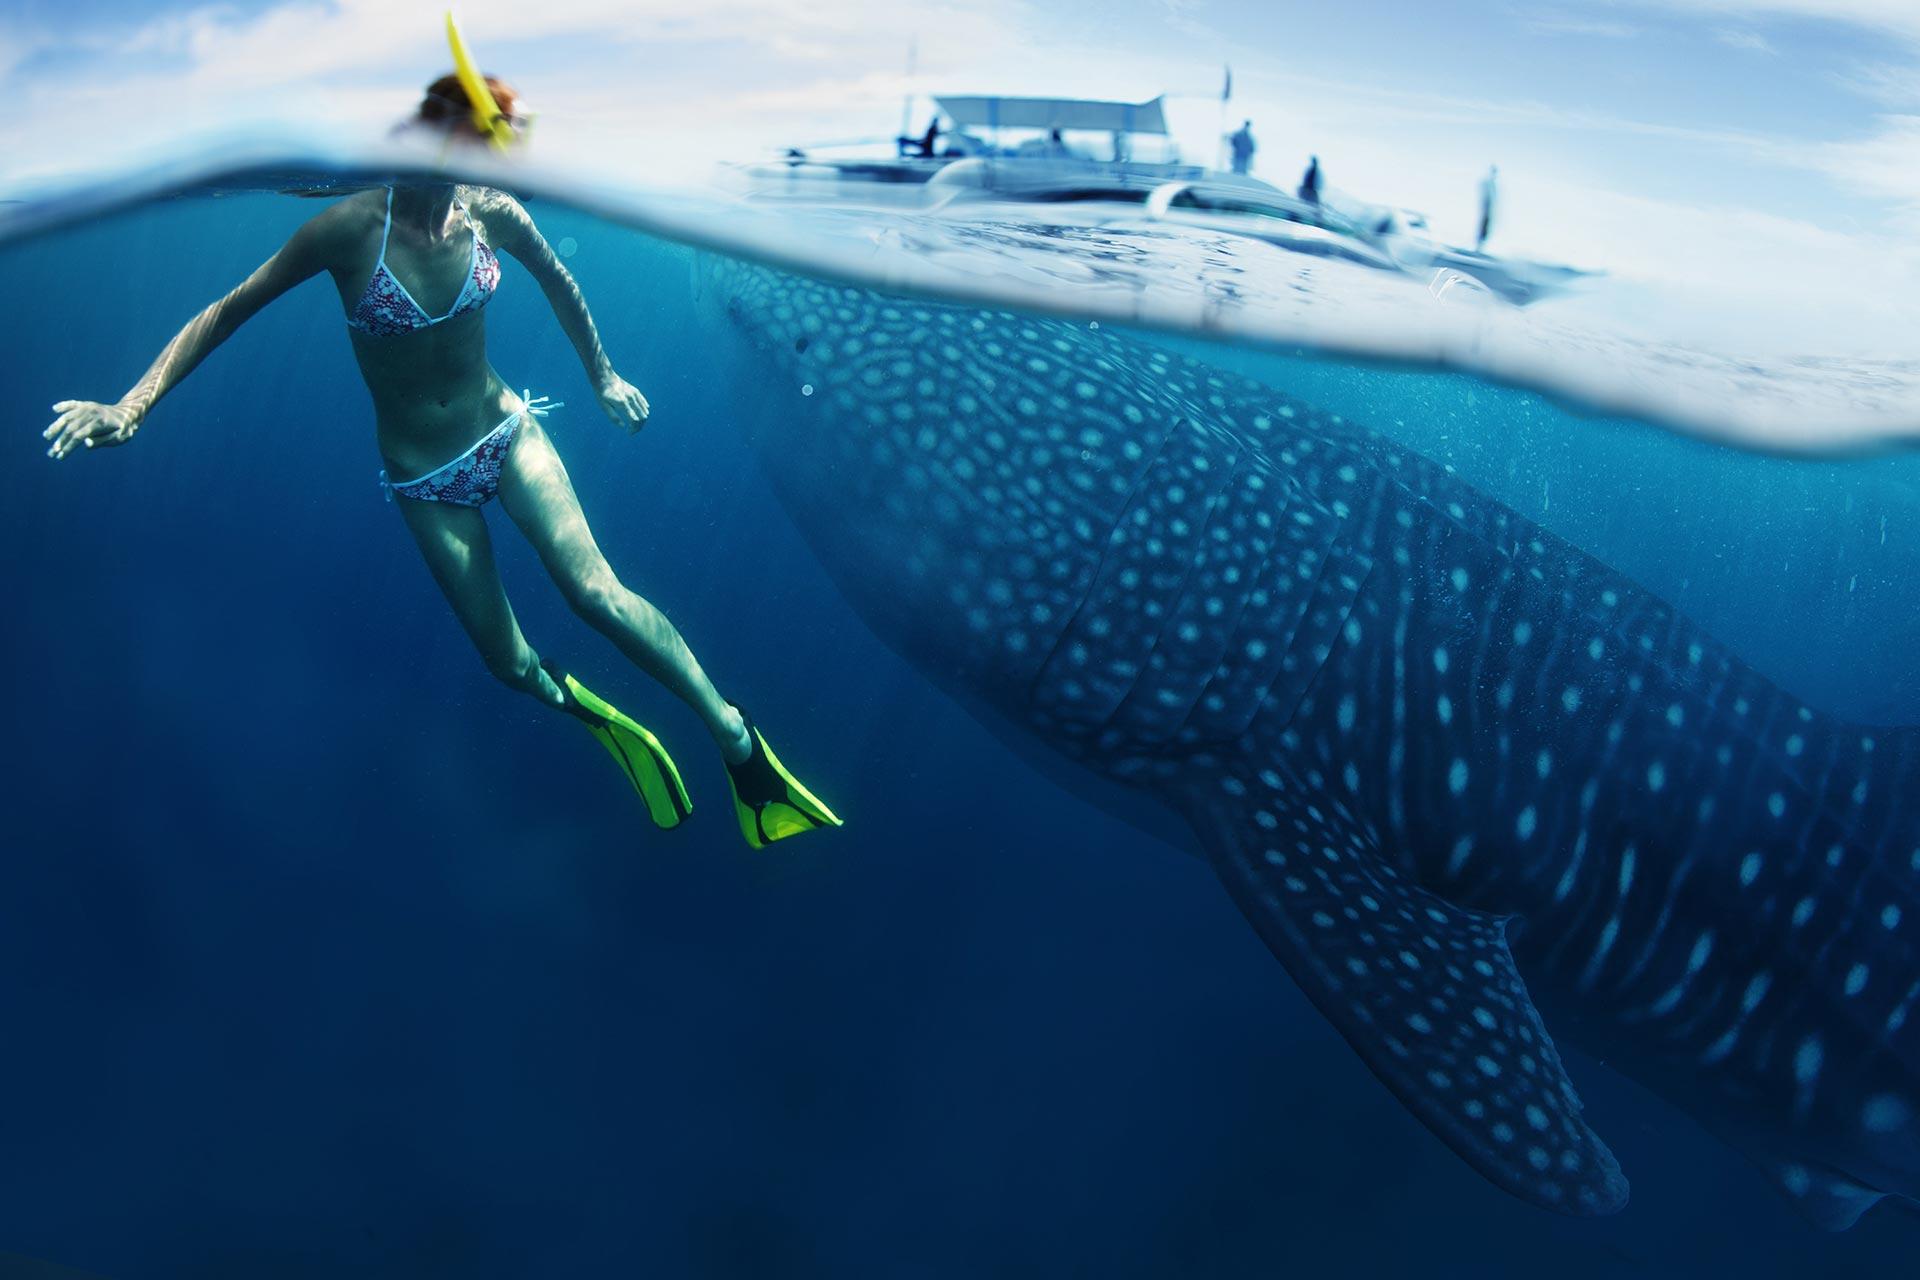 дайвинг, китовая акула, diving, Самуи, дайвинг на Самуи, Таиланд